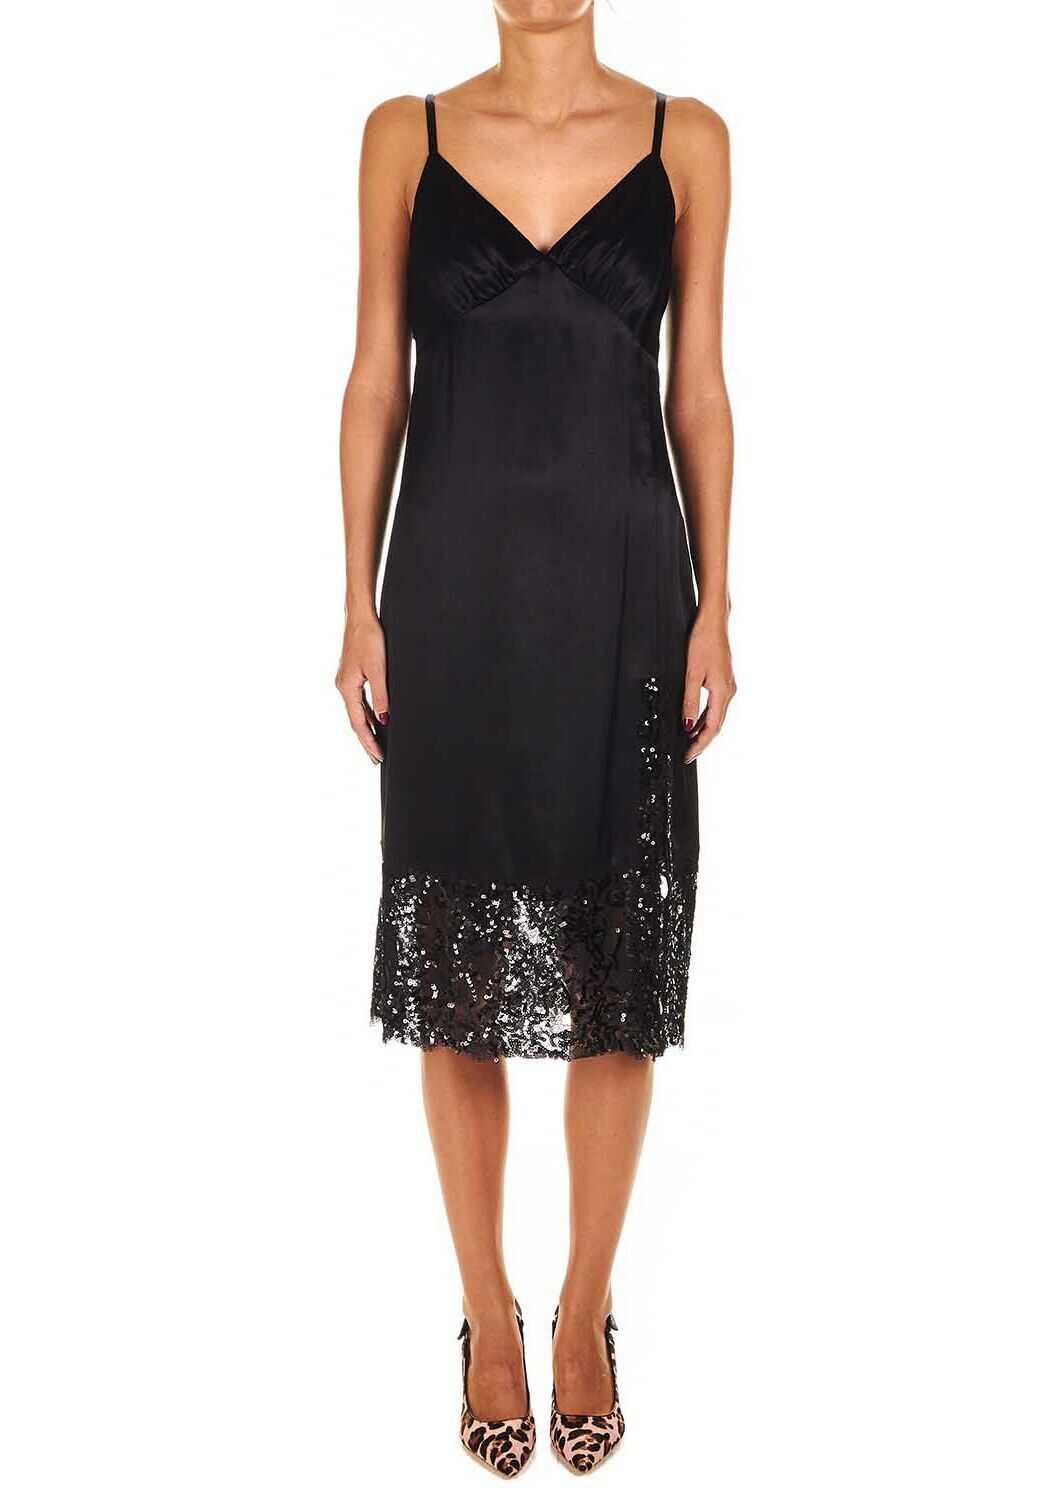 Michael Kors Satin slip dress Black